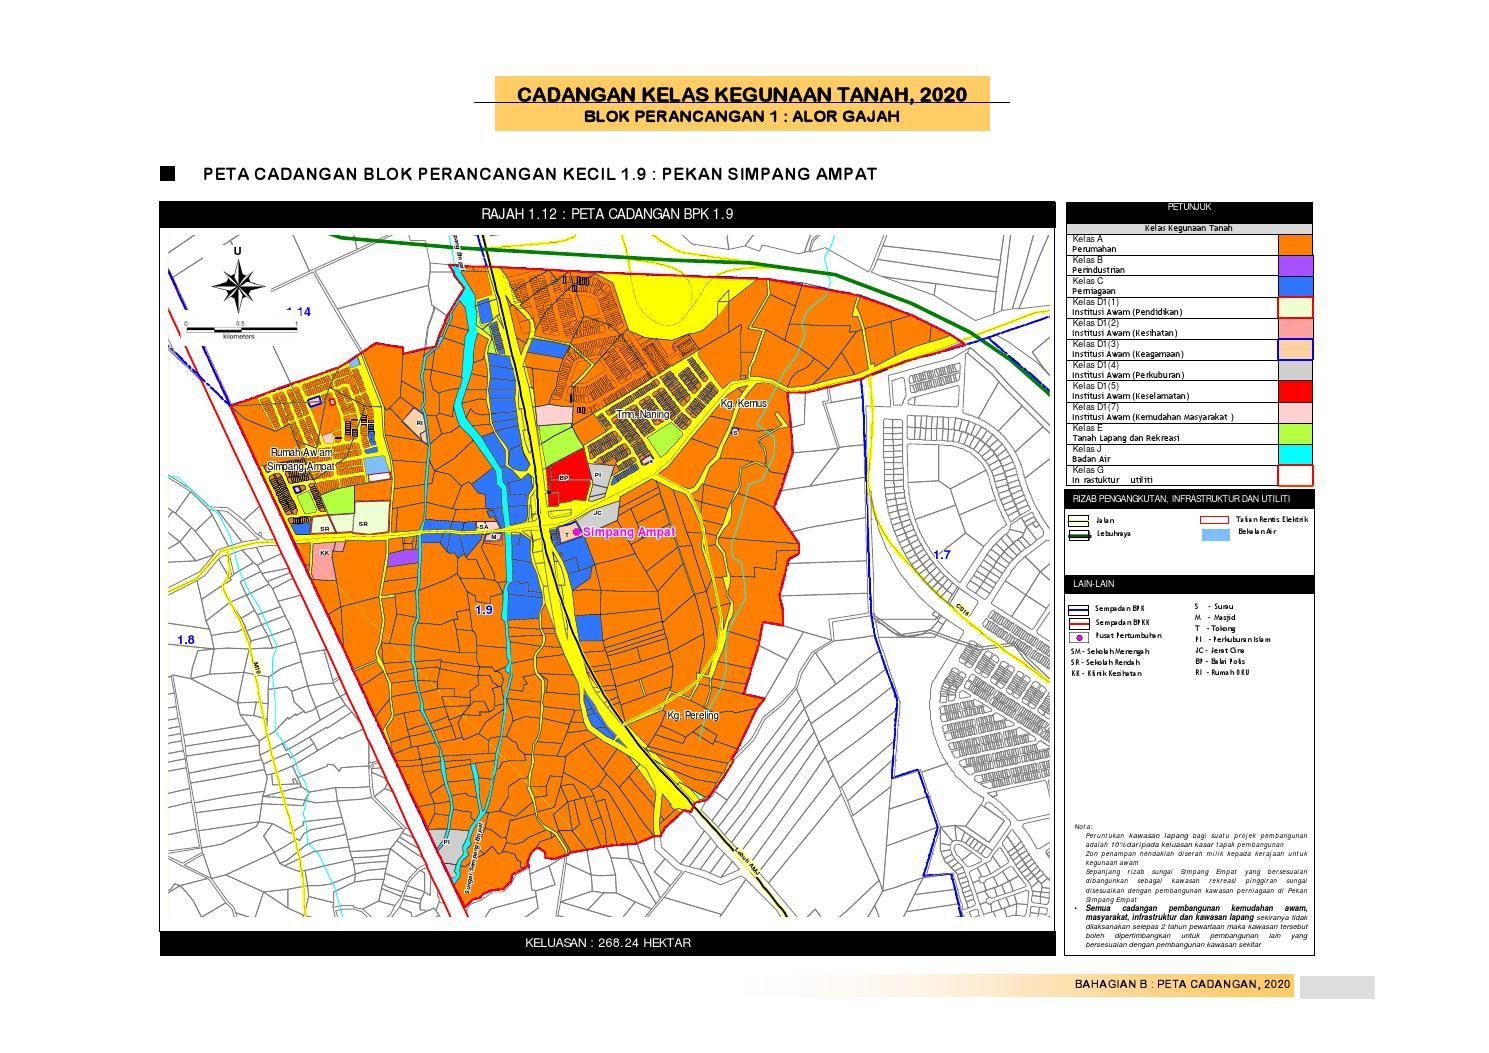 Rancangan tempatan daerah alor gajah by uppjpbd issuu ccuart Gallery